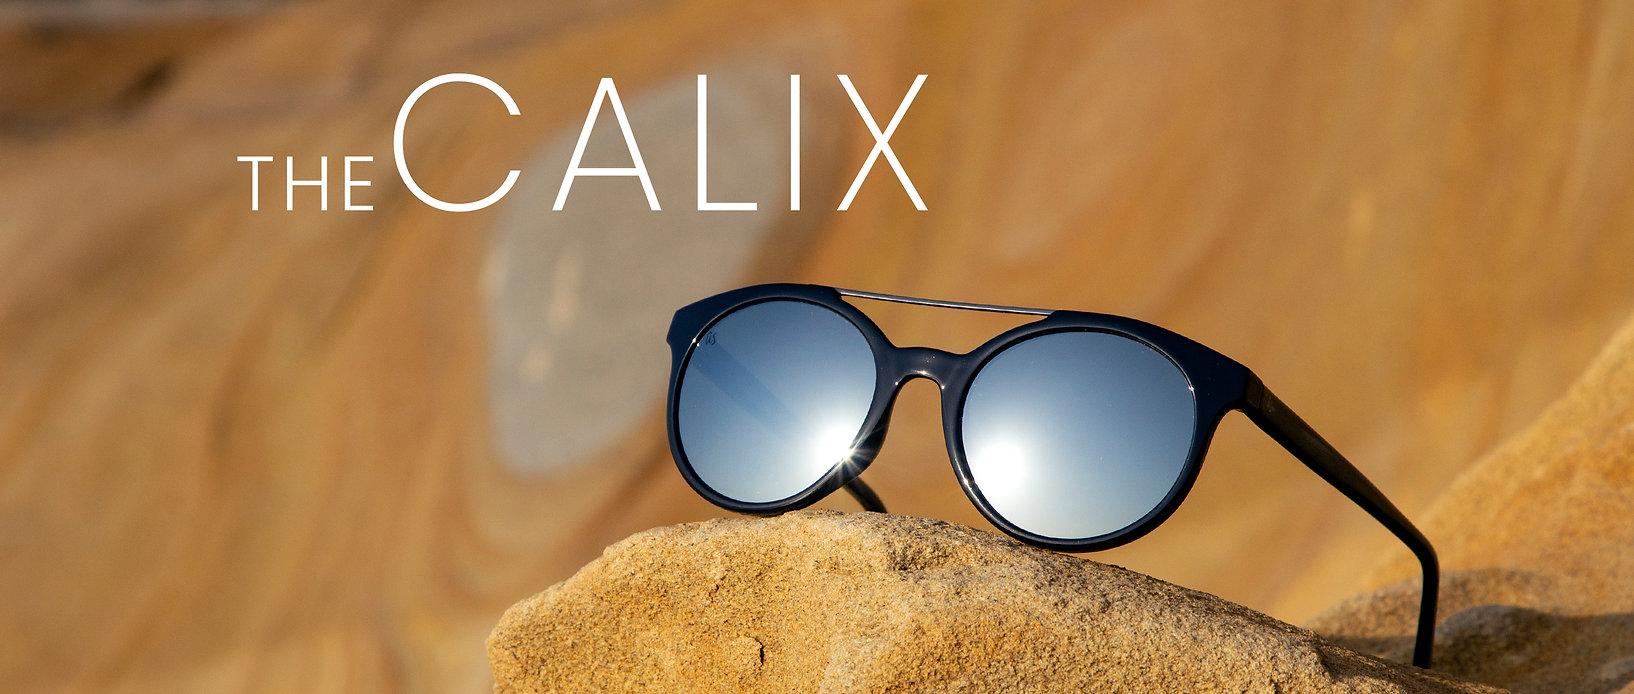 the-calix-sunglasses-us-eyewear-banner02.jpg